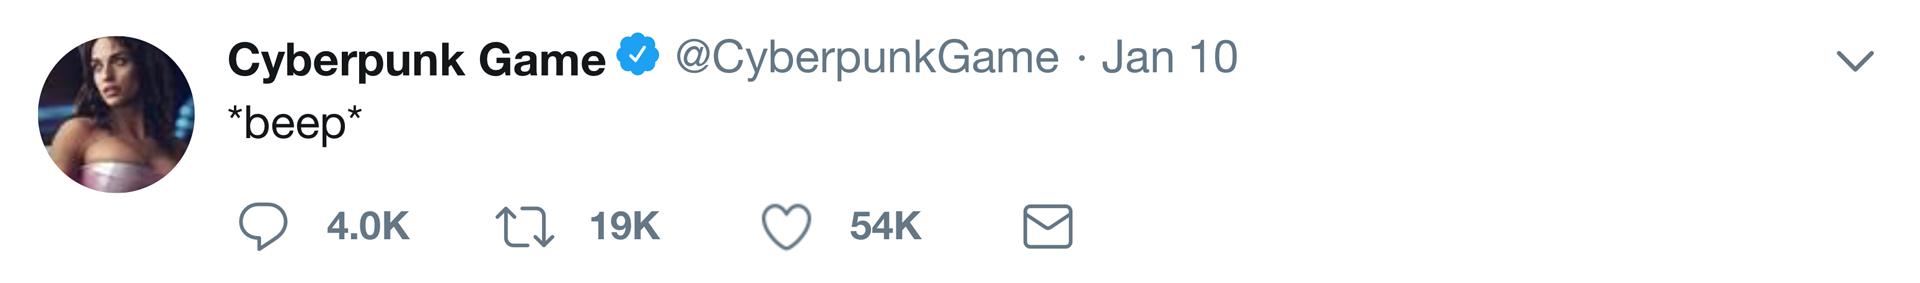 Cyberpunk Tweet